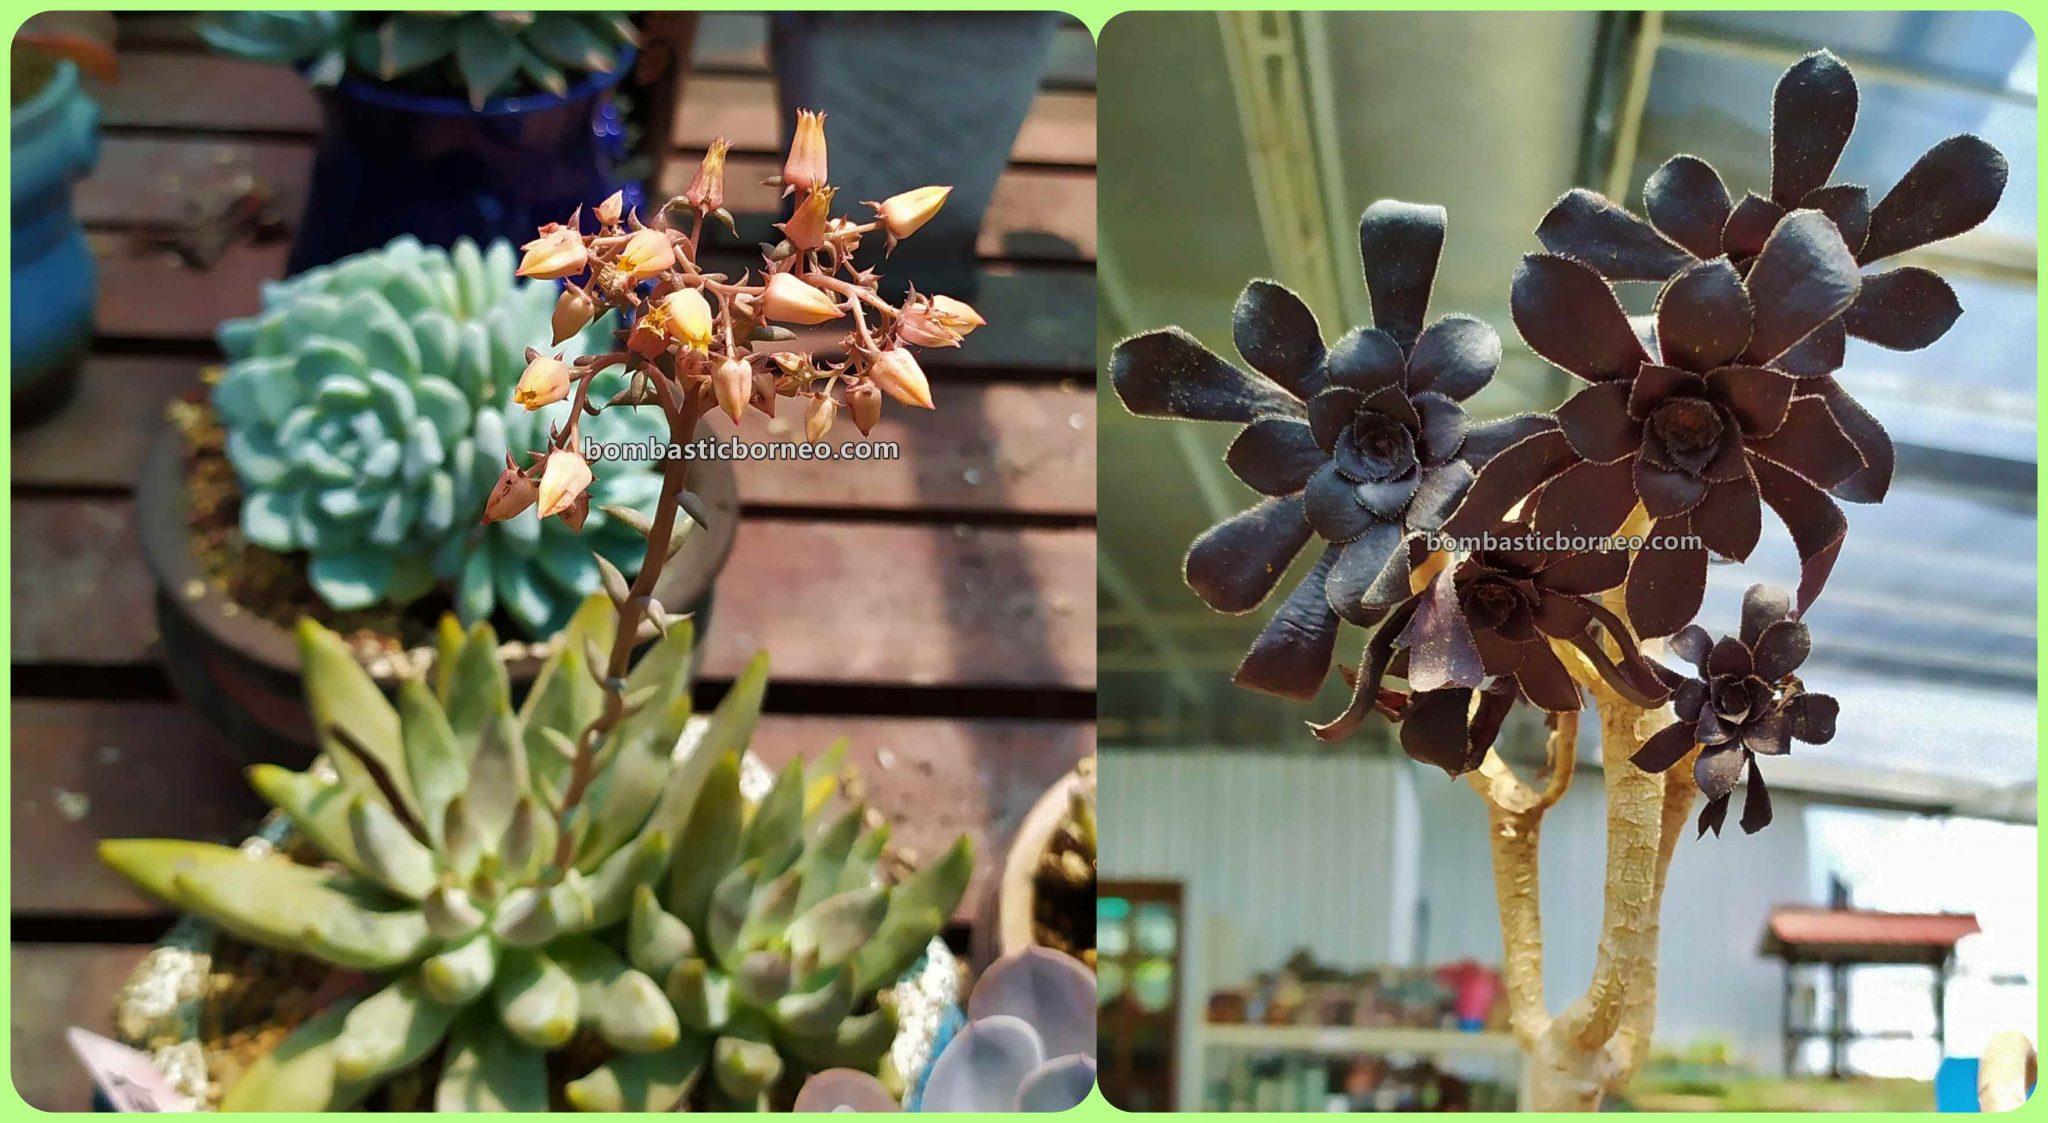 LS Succulent Garden, cactus, Ornamental Plants, Tanaman Kaktus, botany, flora, nature, exploration, hobby, Tourism, tourist attraction, 穿越婆罗洲马来西亚, 砂拉越美里旅游景点, 雷氏多肉植物花圃,